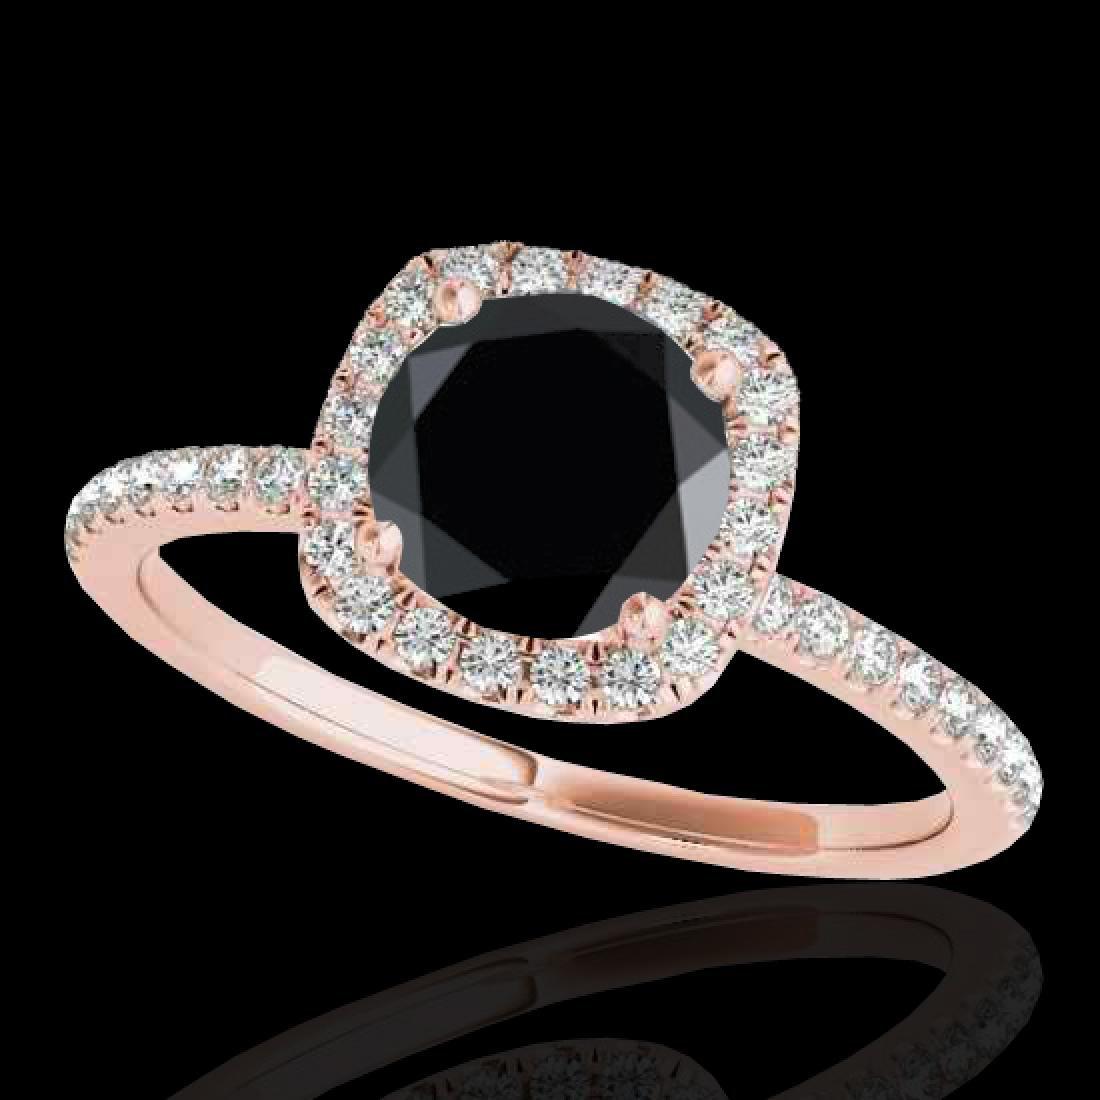 1.25 CTW Certified VS Black Diamond Solitaire Halo Ring